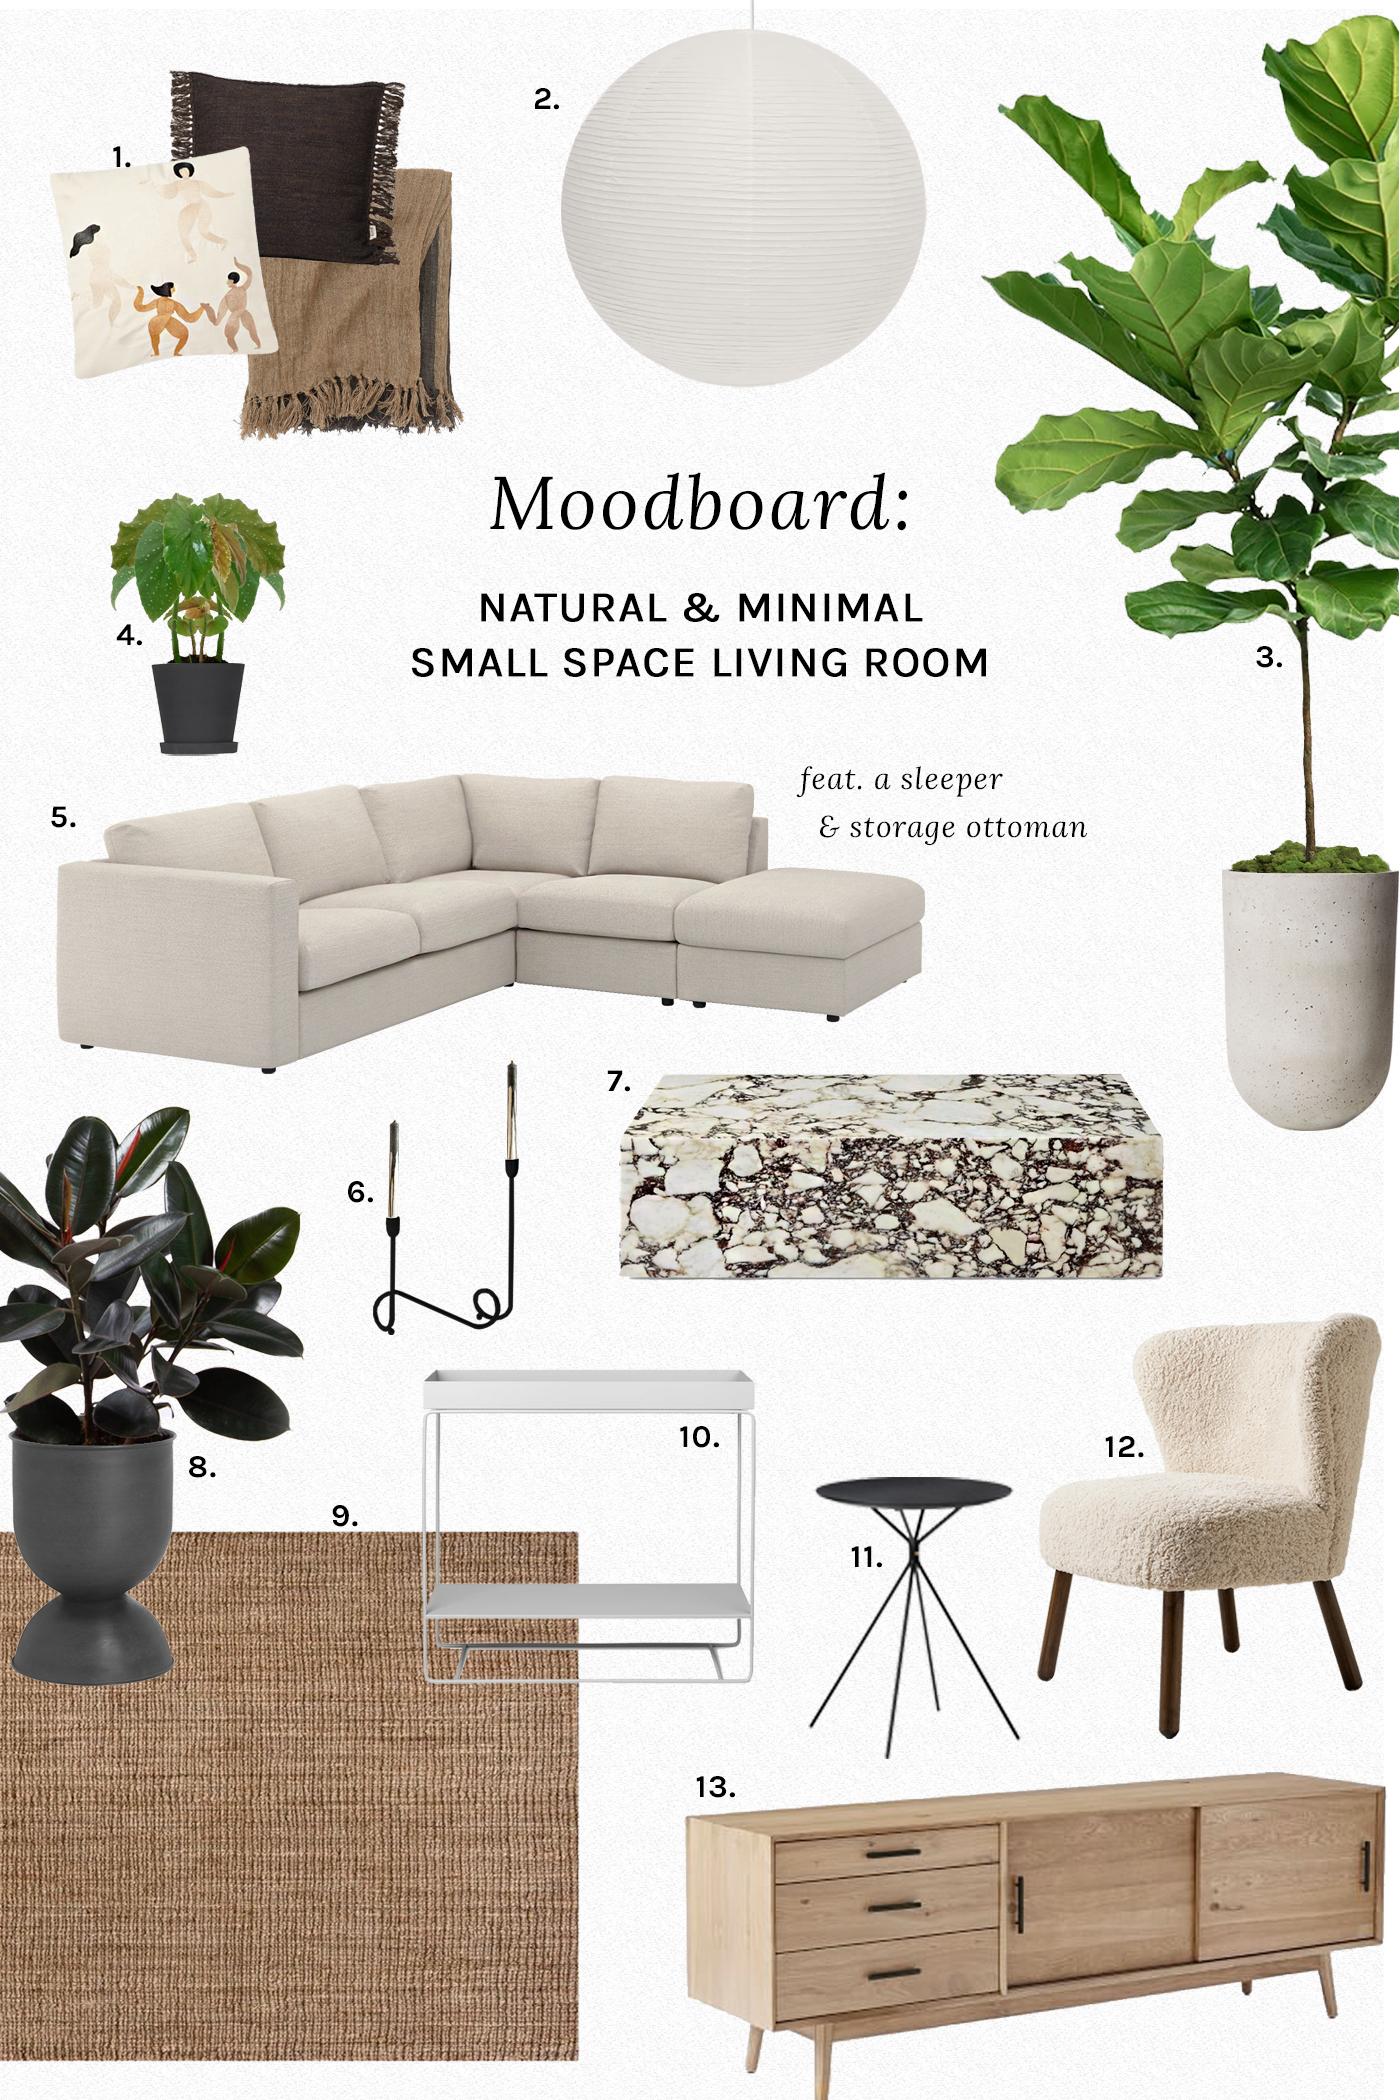 Moodboard: Natural & Minimal Small Space Living Room